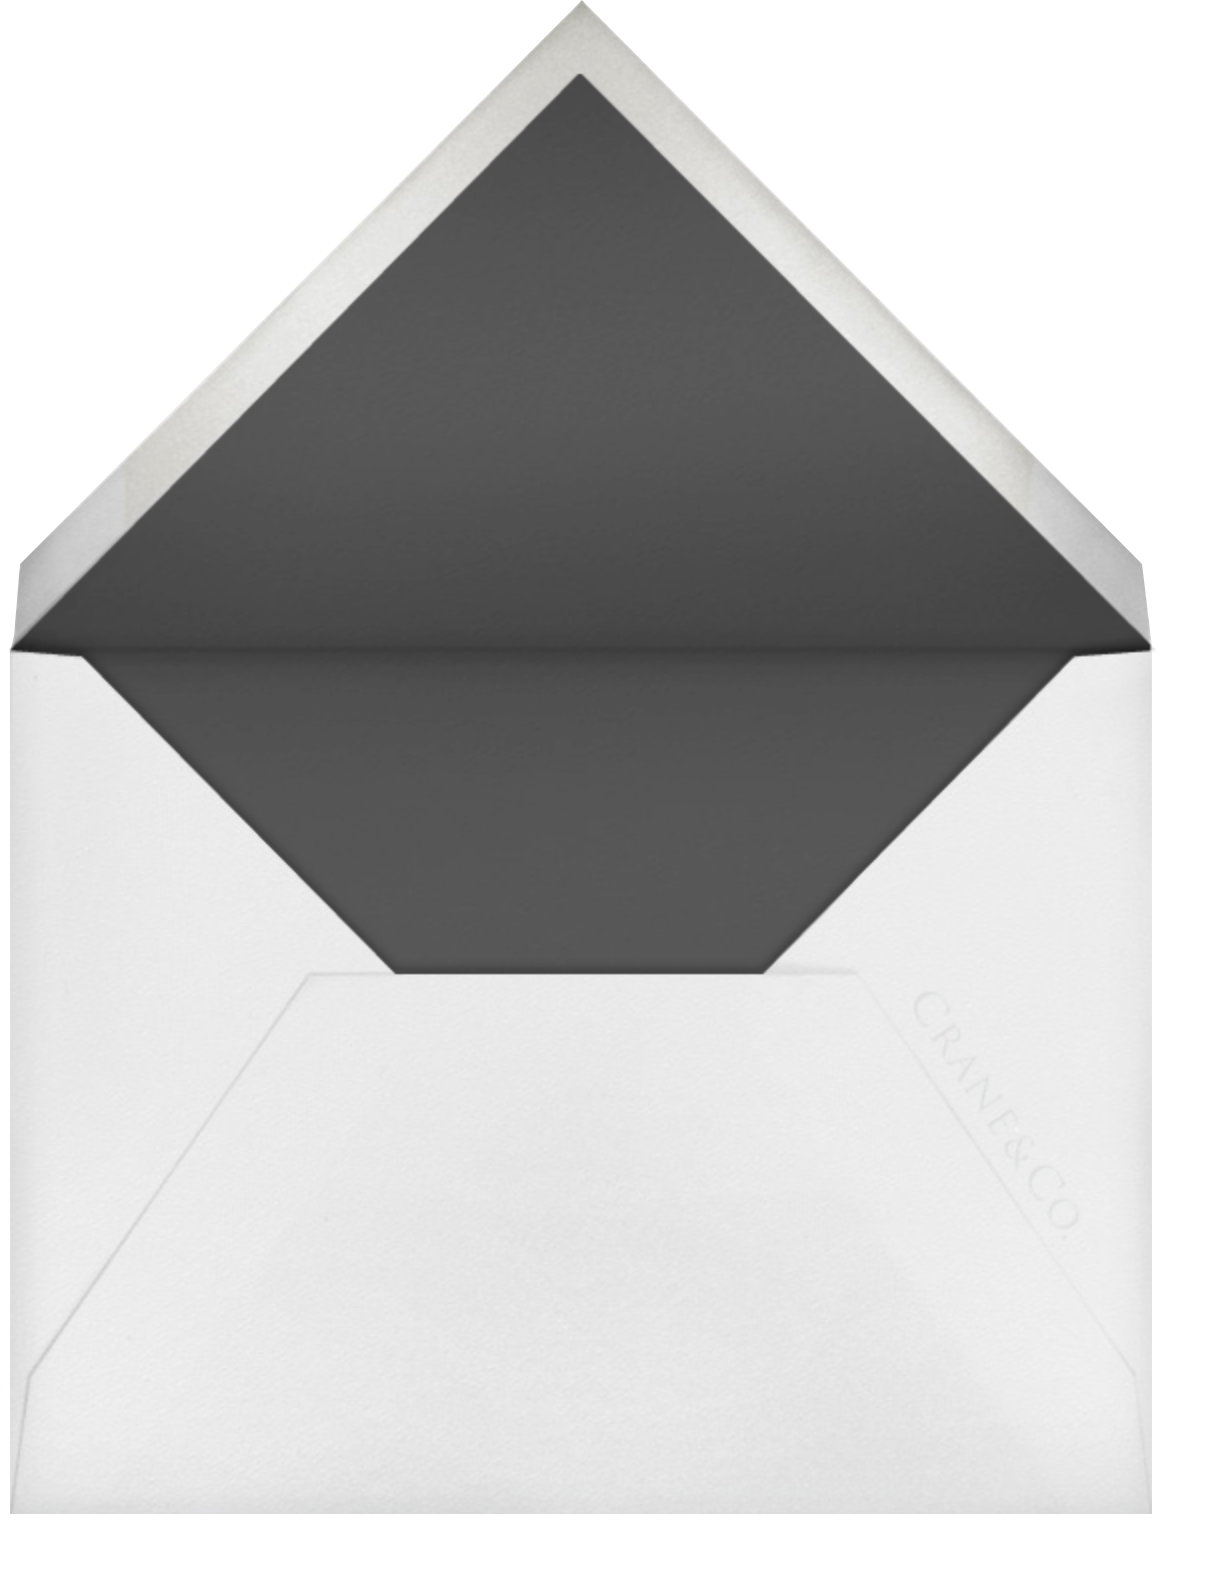 Bermondsey - Charcoal Gray - Paperless Post - Envelope